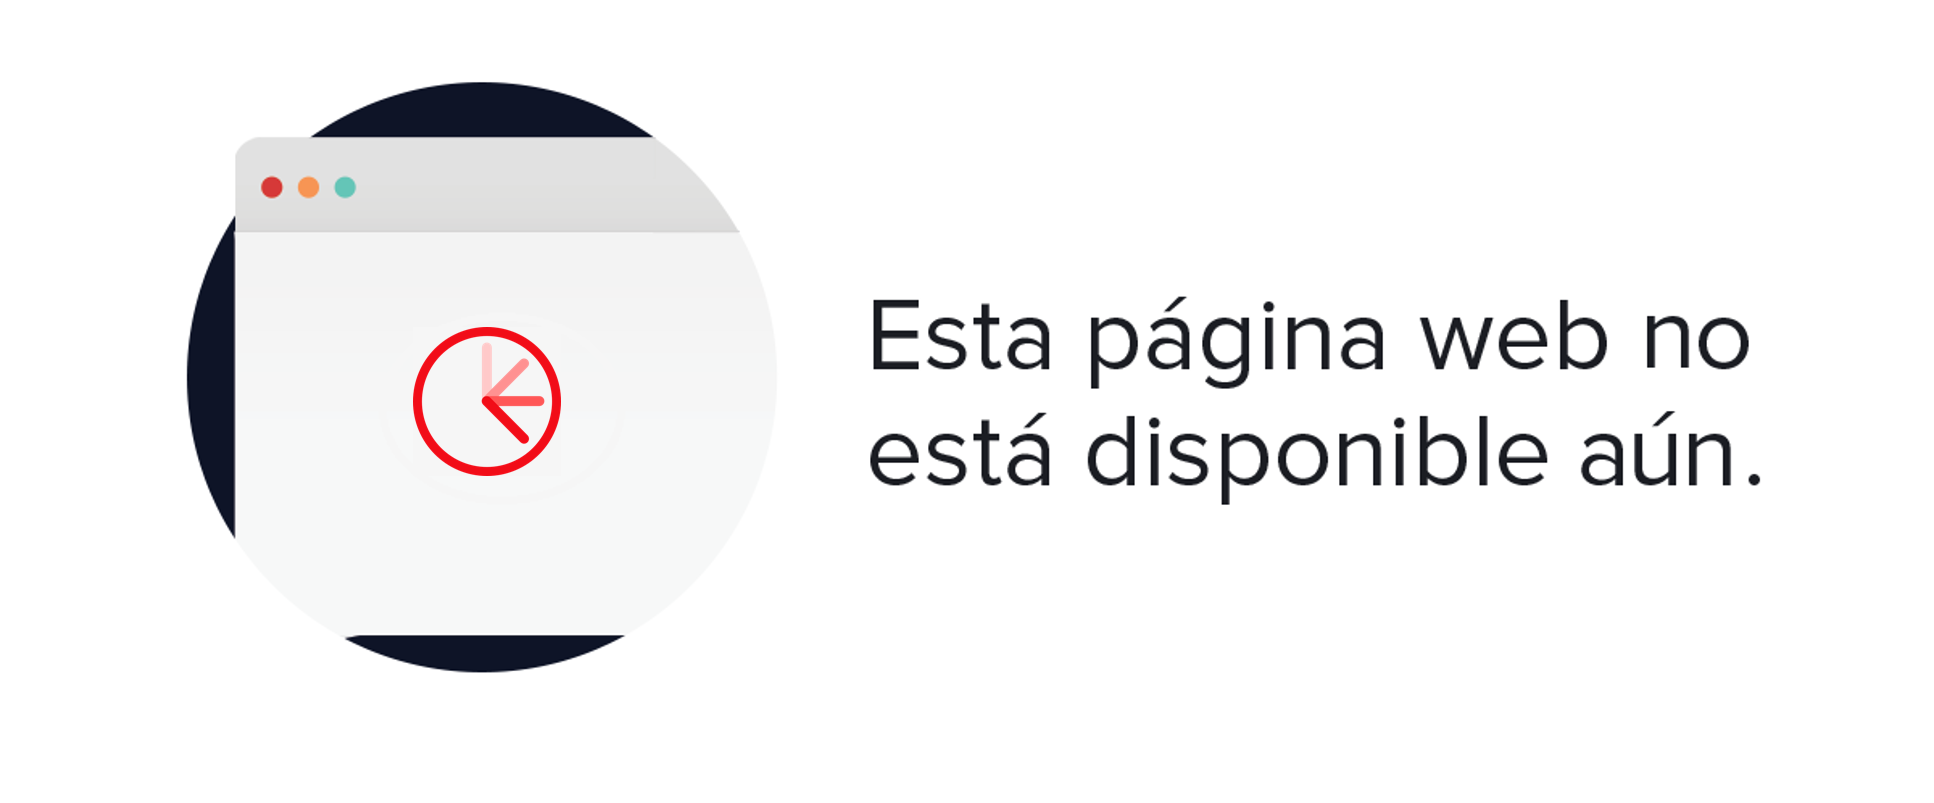 Chaqueta americana mujer símil piel beig 1TS063176